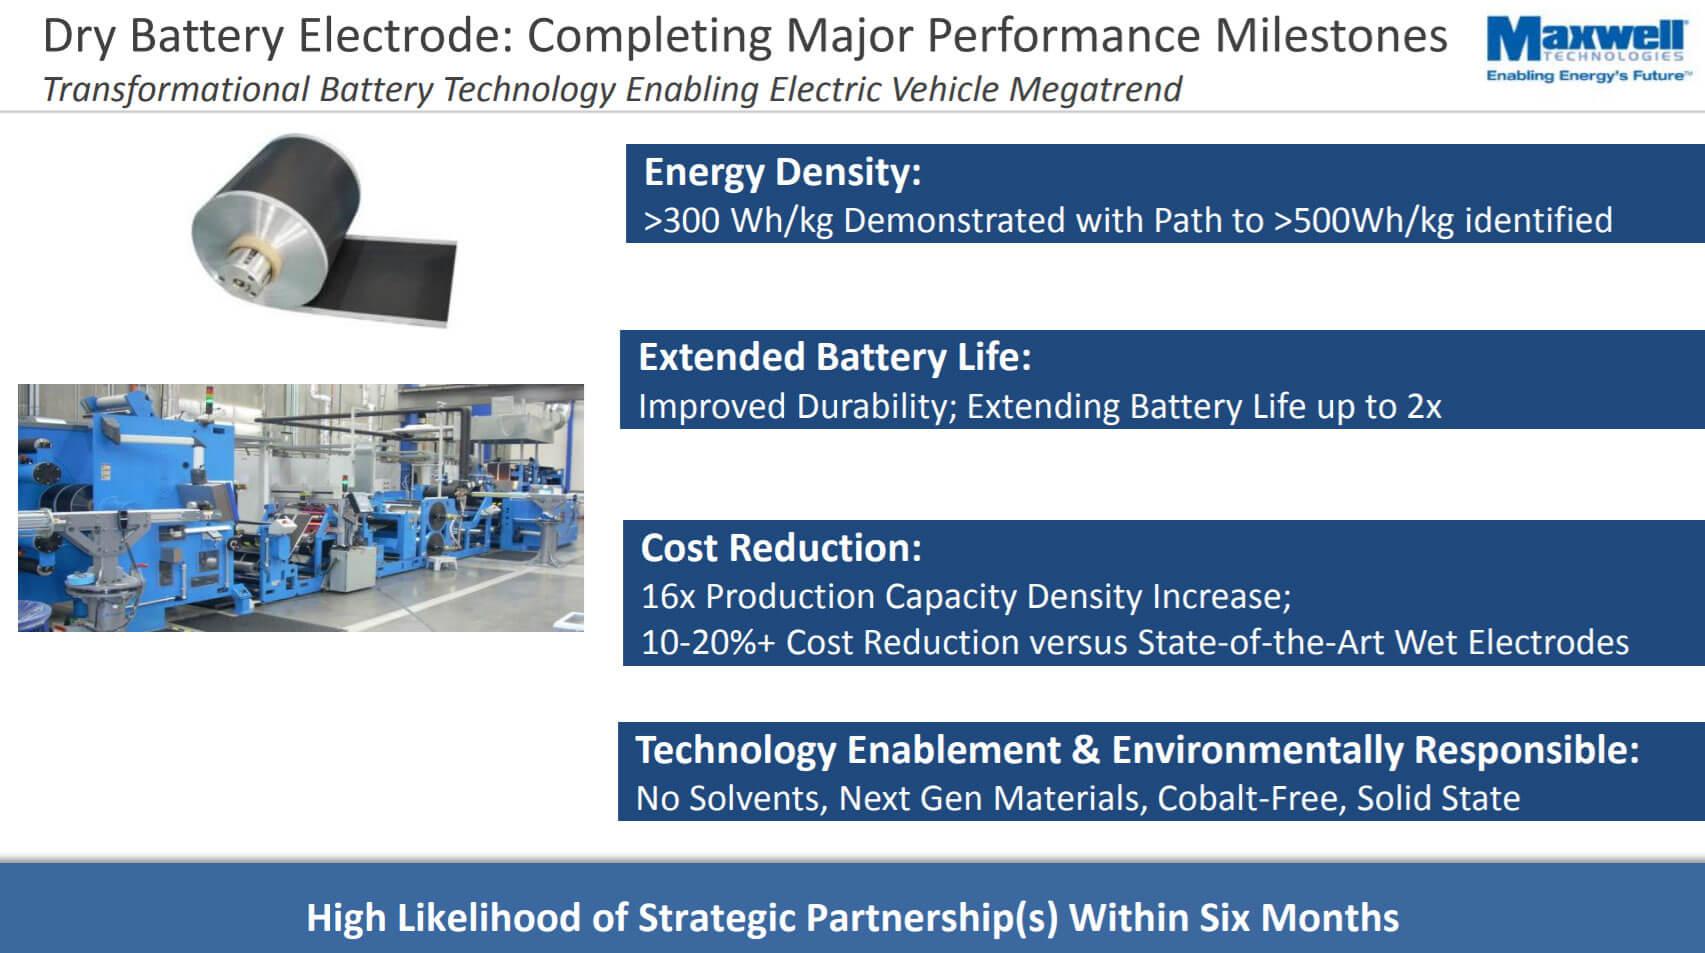 Maxwell производит ультраконденсаторы и компоненты для аккумуляторных батарей